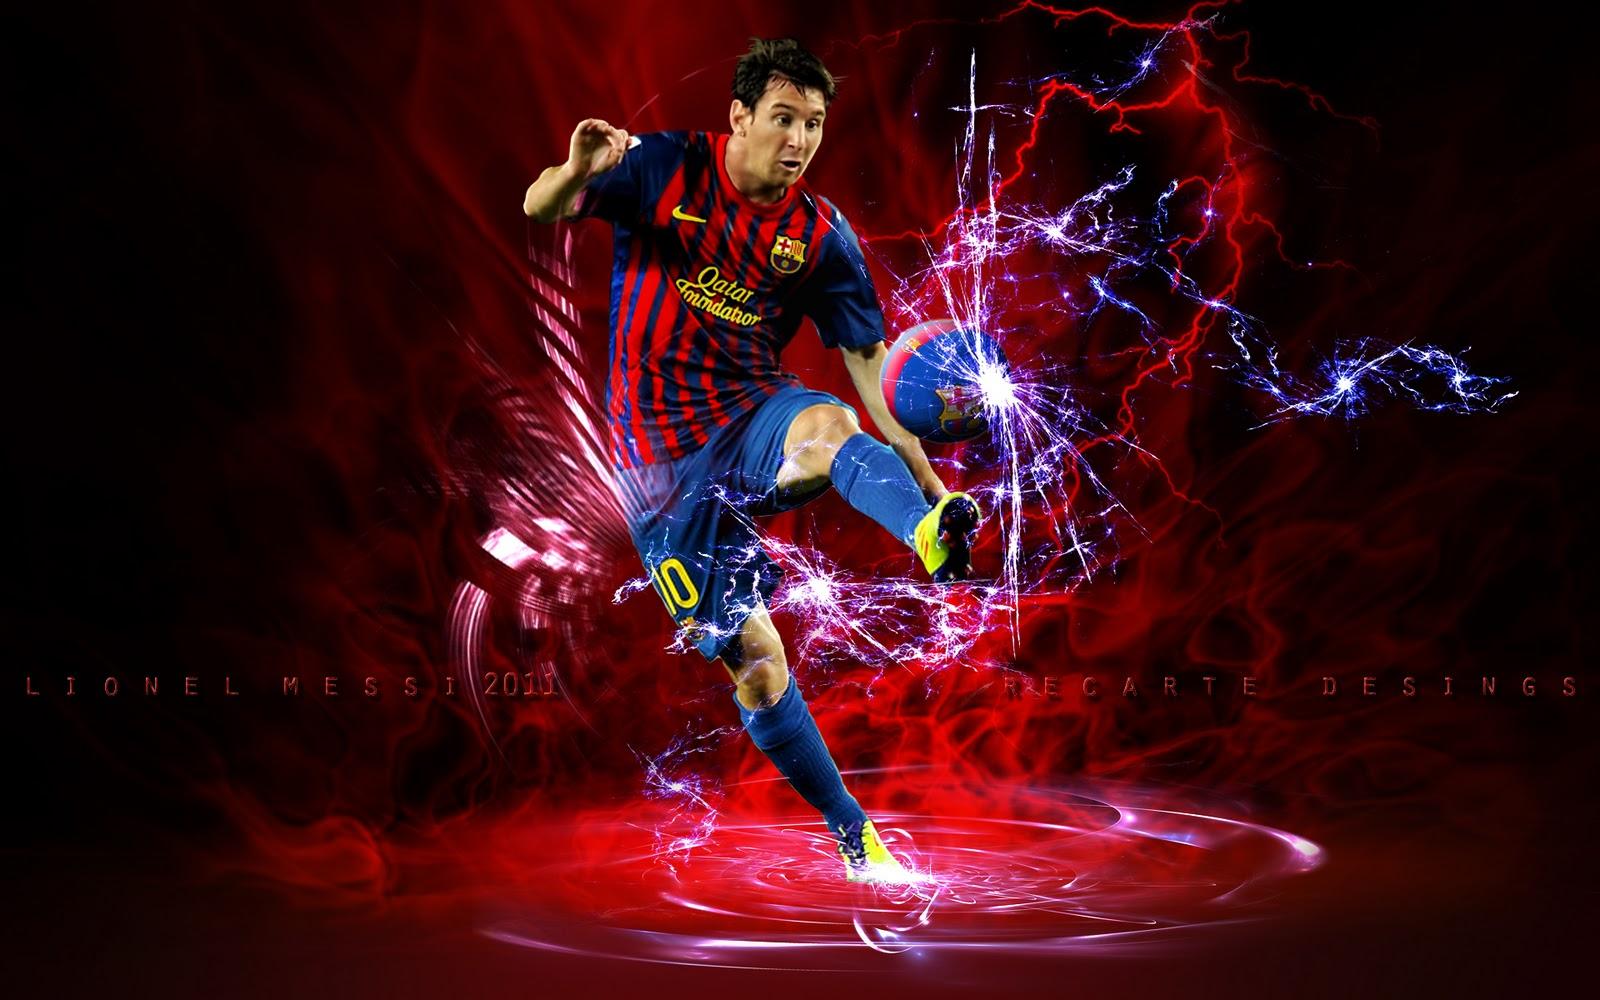 http://3.bp.blogspot.com/-aJjYPCtbp_4/UVI8cbrIwkI/AAAAAAAAAcU/AyO3B65d8iw/s1600/Messi+Flujo.jpg